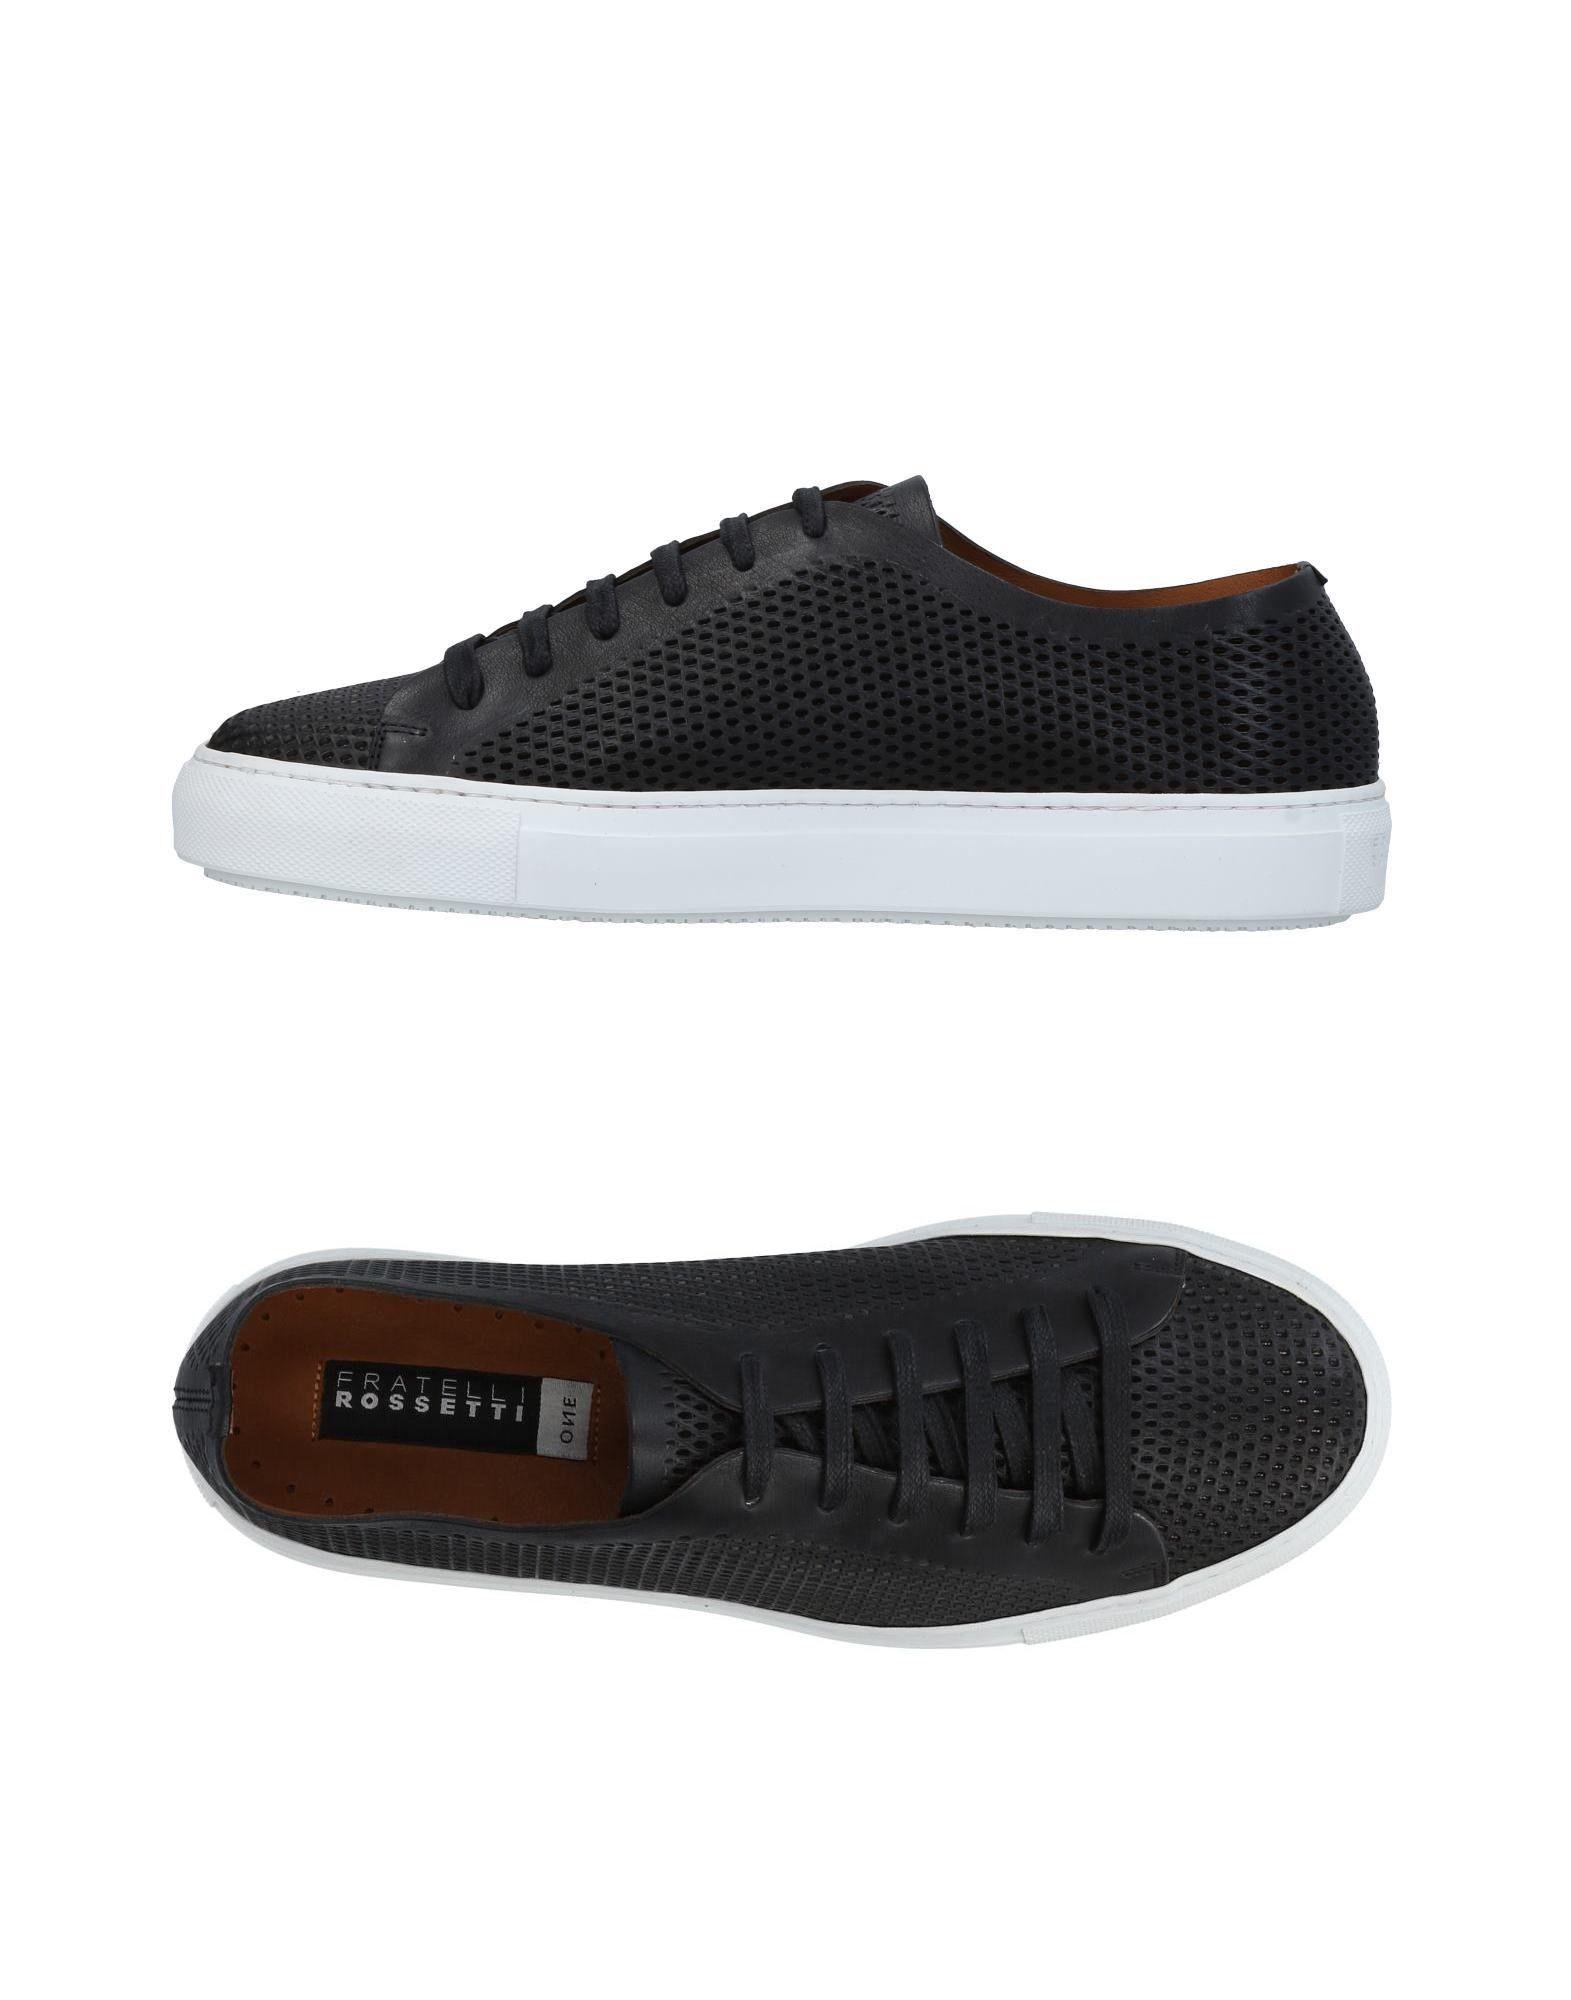 Fratelli Rossetti Sneakers Herren  11440589PA Gute Qualität beliebte Schuhe